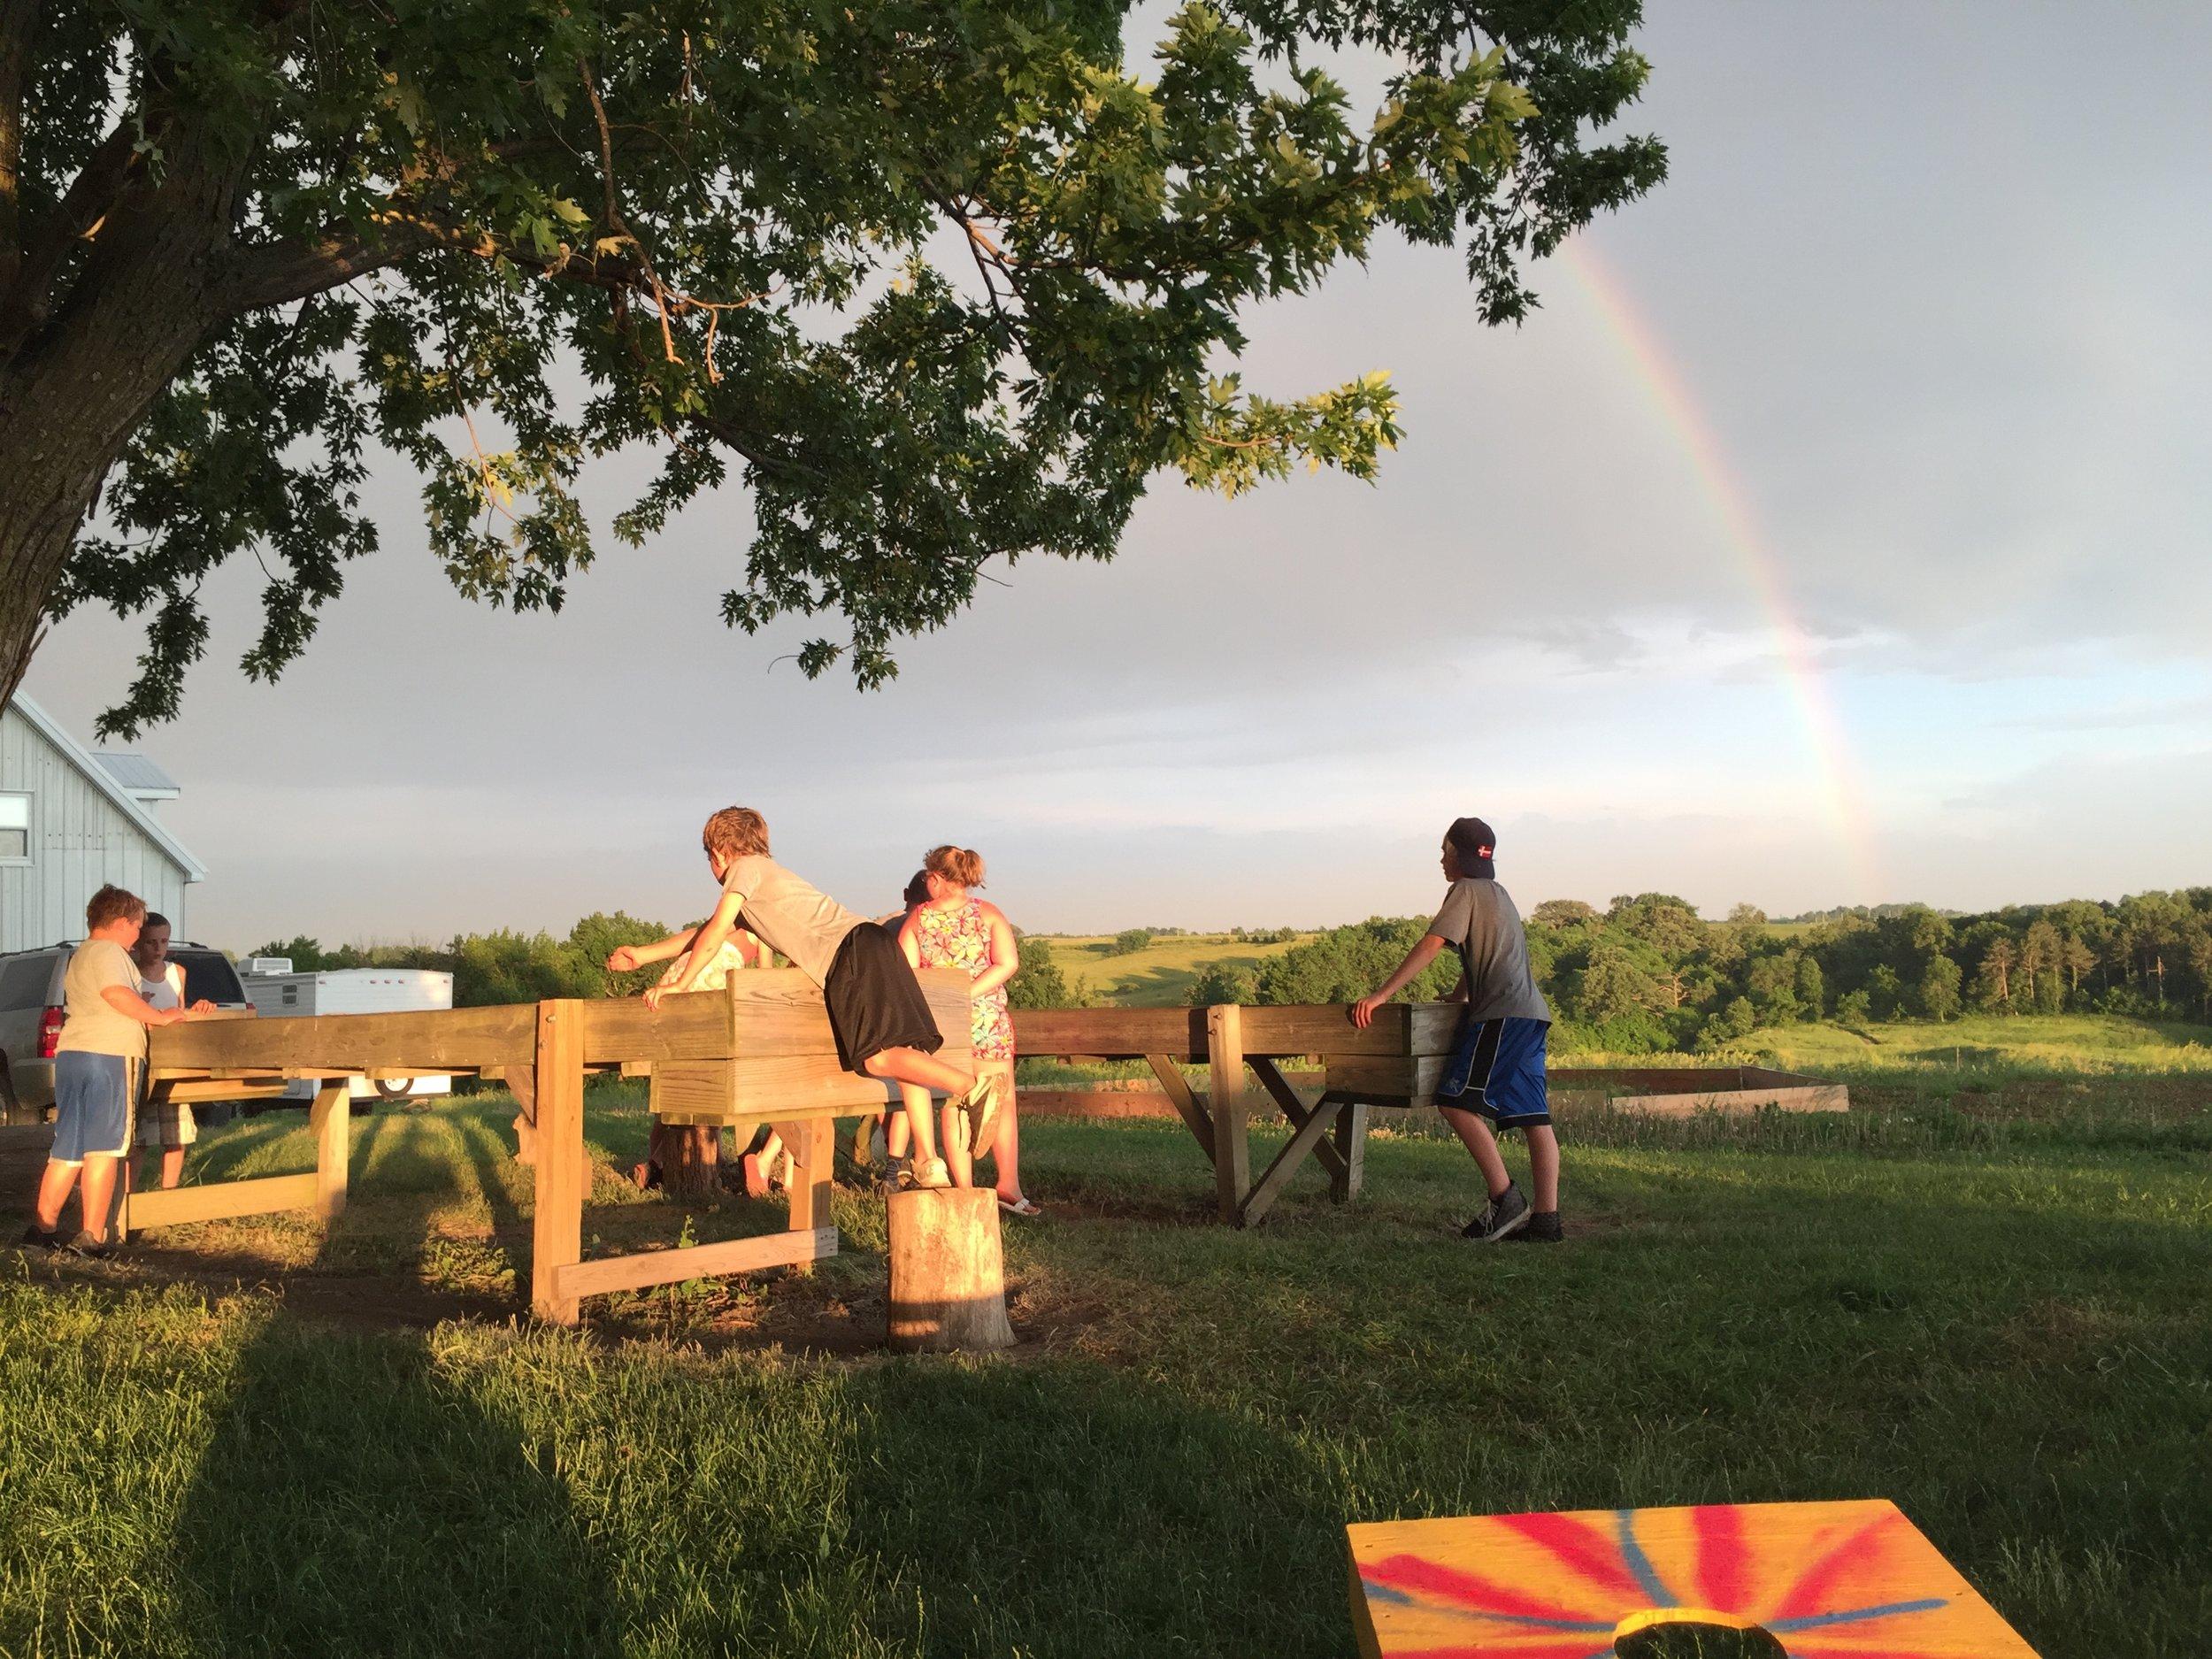 Evening sun, evening fun. And rainbow!